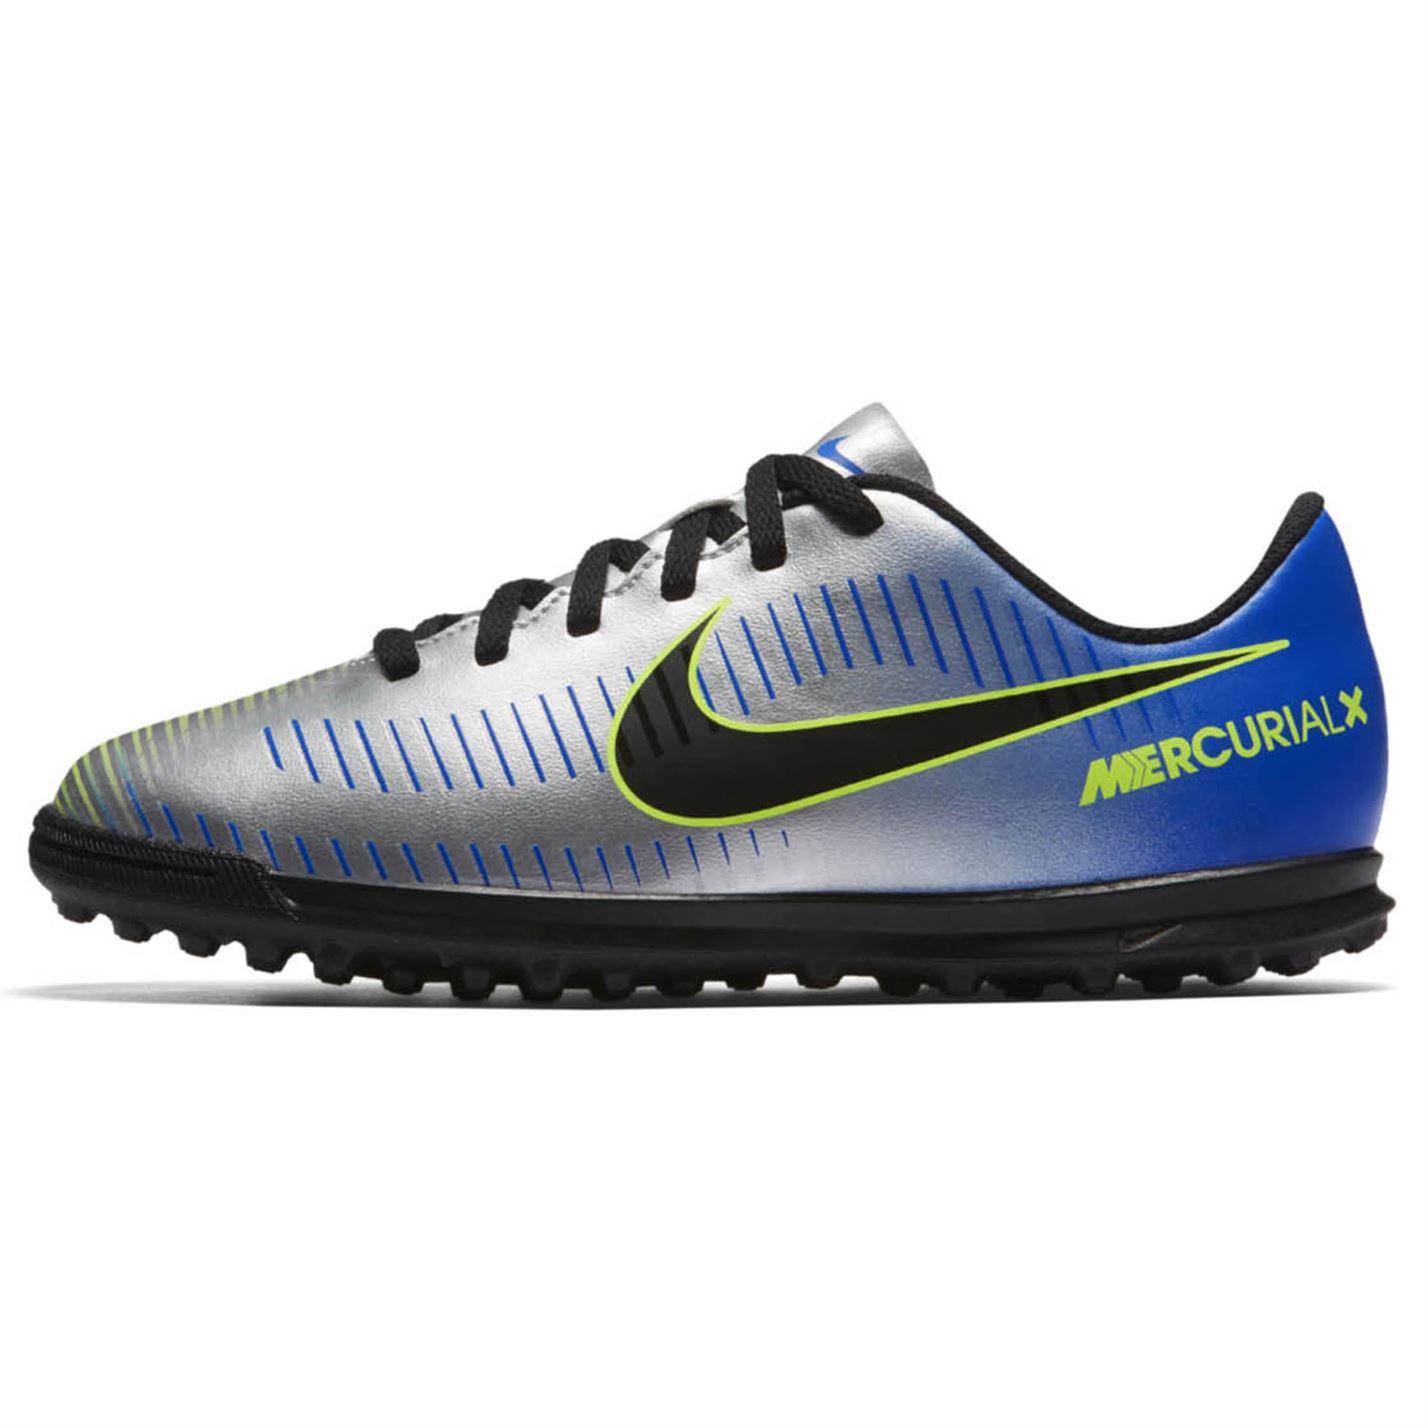 db5c00ce539 Nike Mercurial Club Neymar Junior Astro Turf Trainers